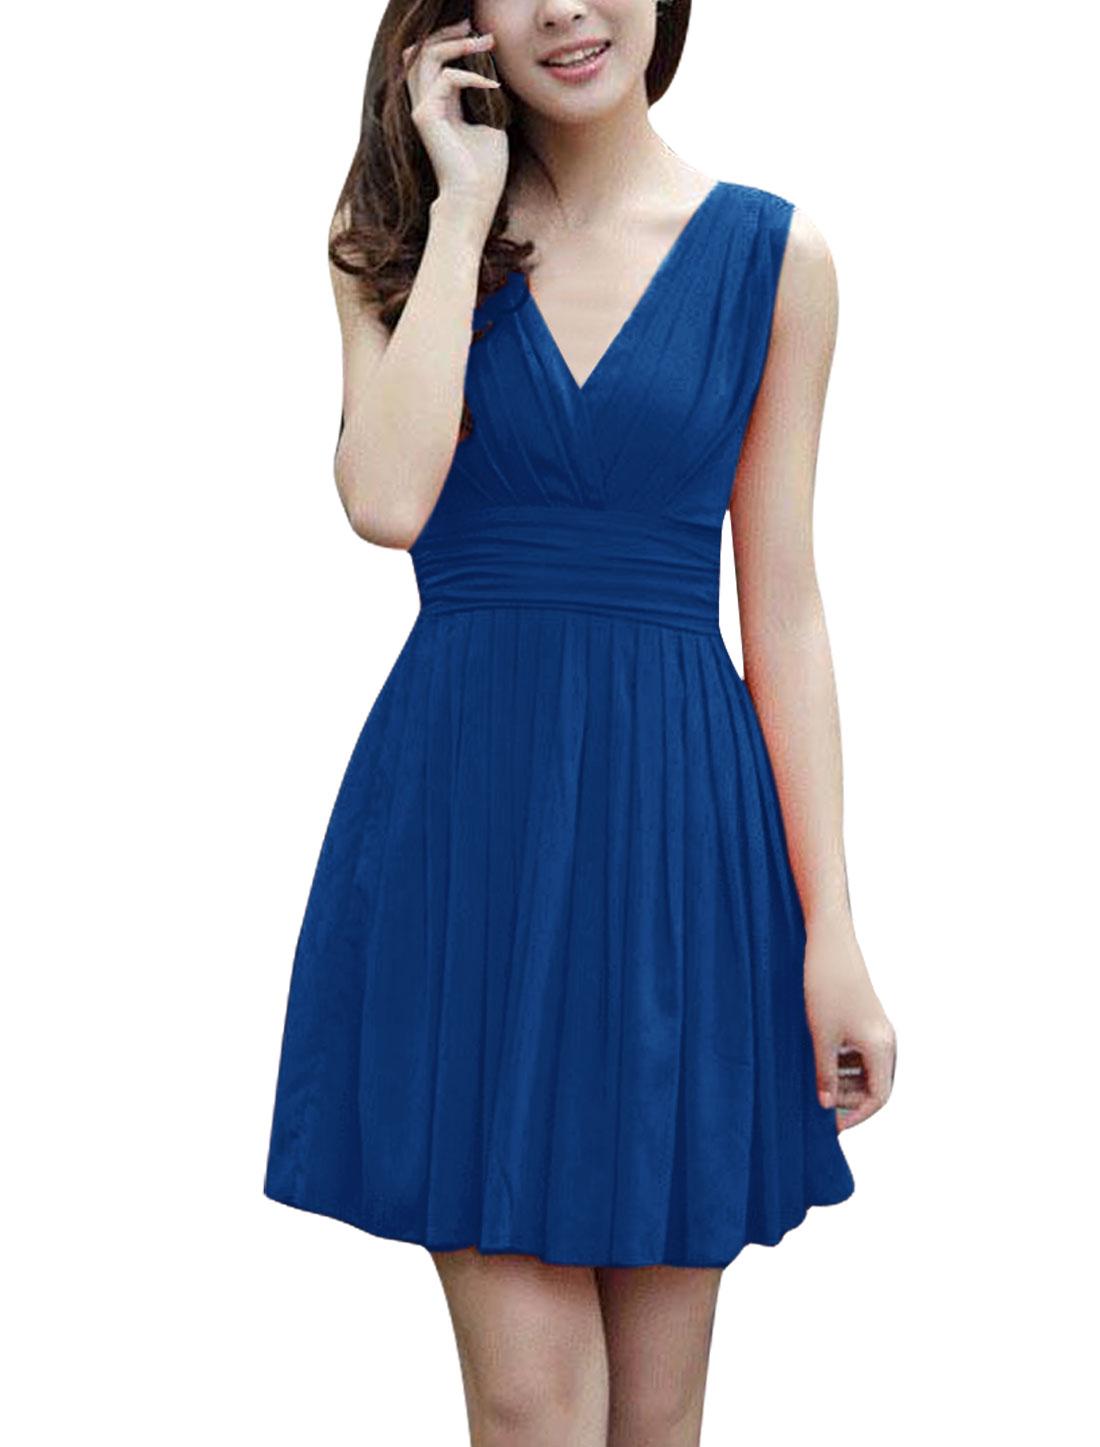 Ladies Deep V Neck Zip Up Back Sleeveless Dress Royal Blue XS